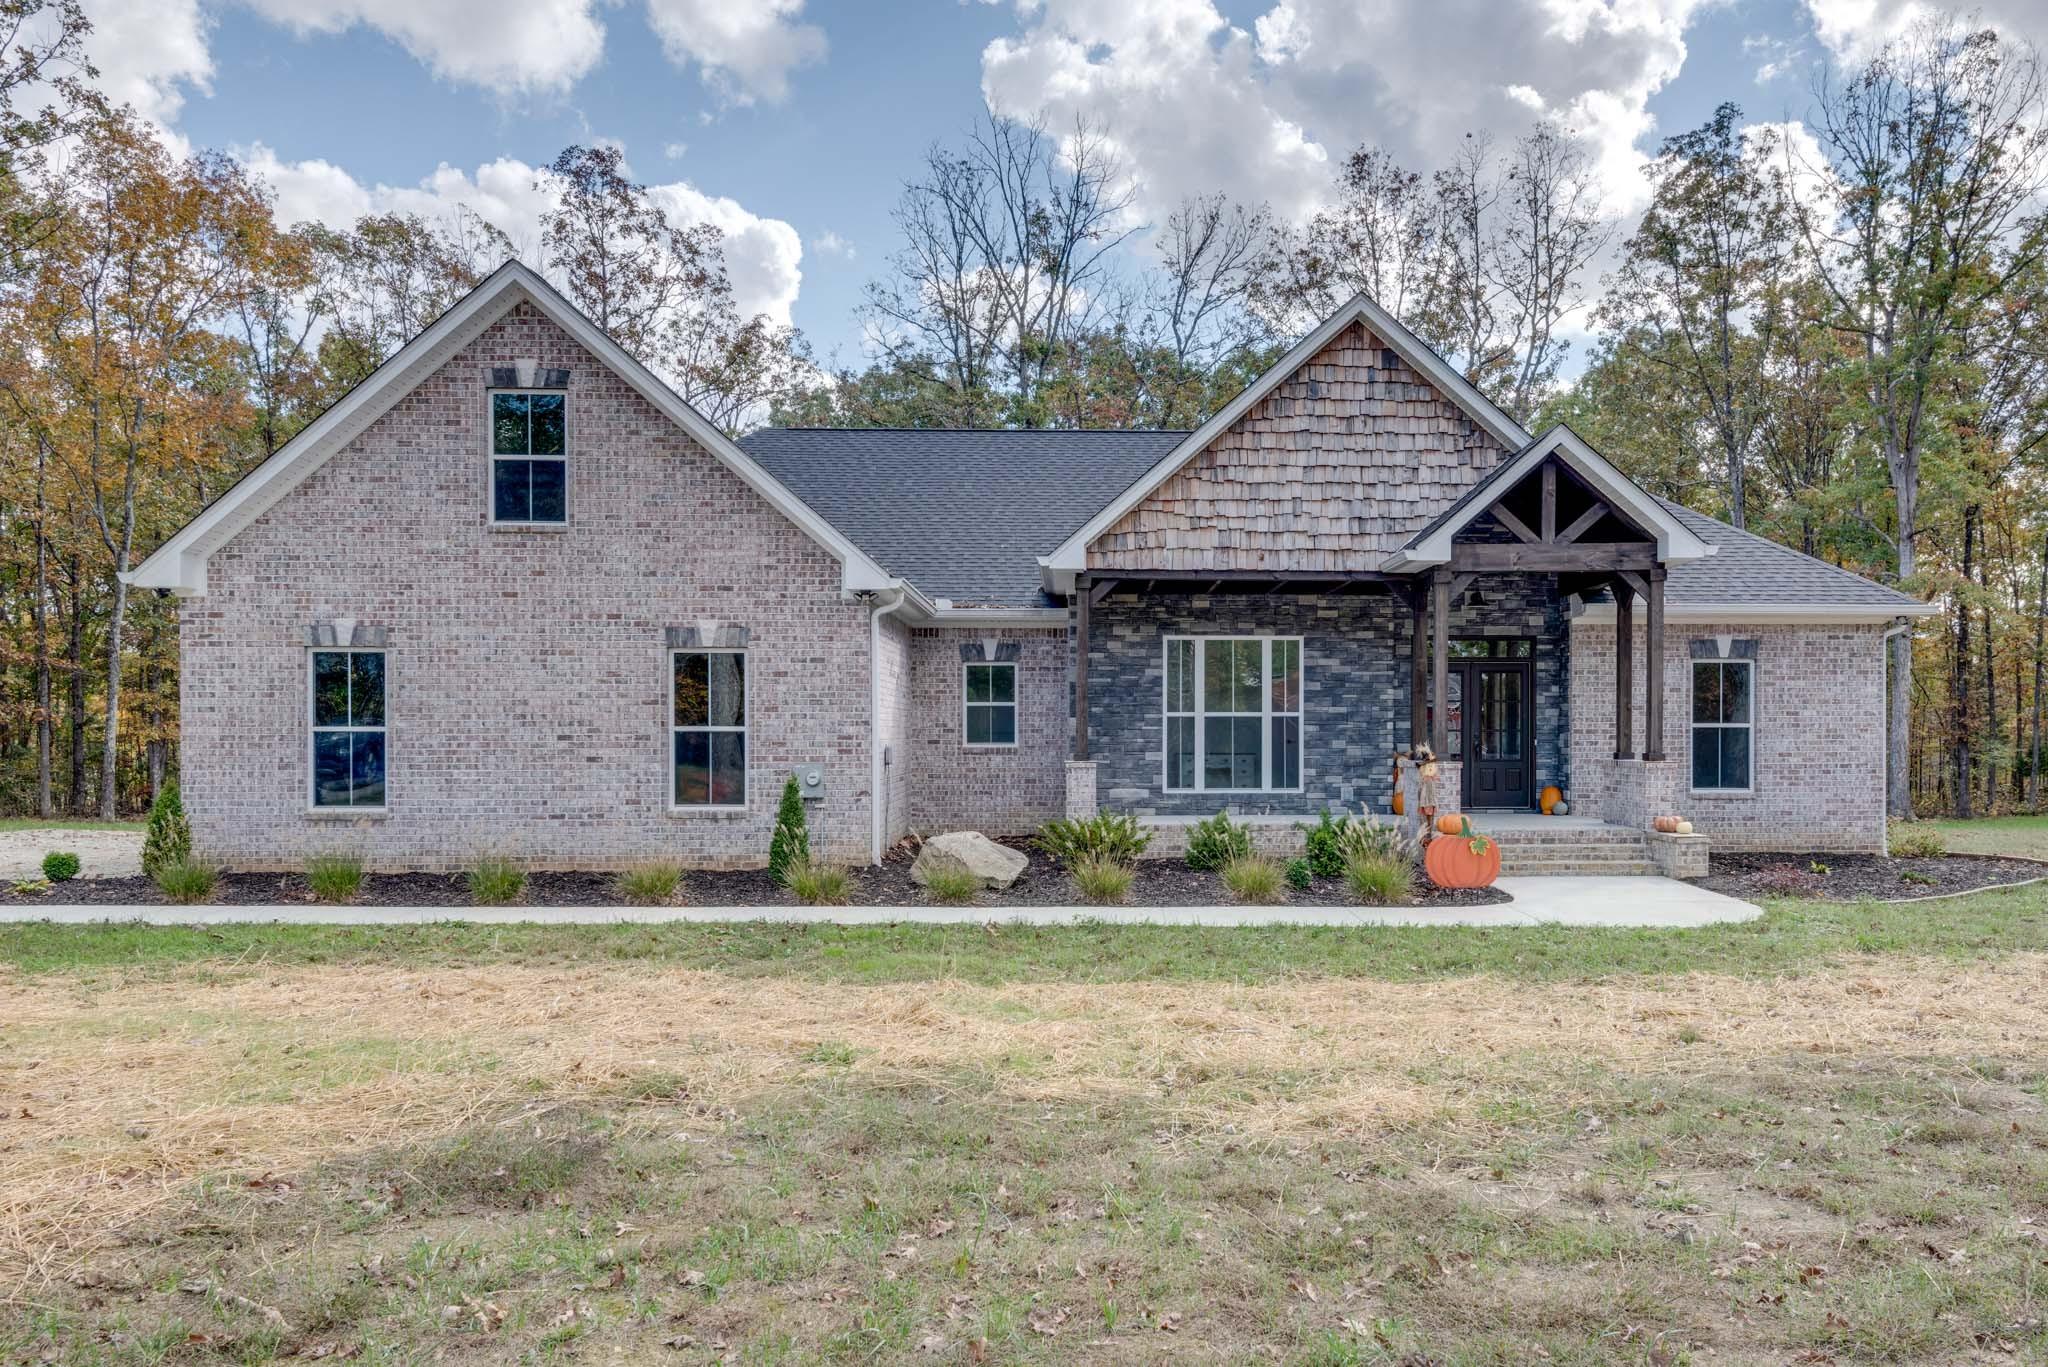 5455 Old Nashville Hwy Property Photo - MC EWEN, TN real estate listing